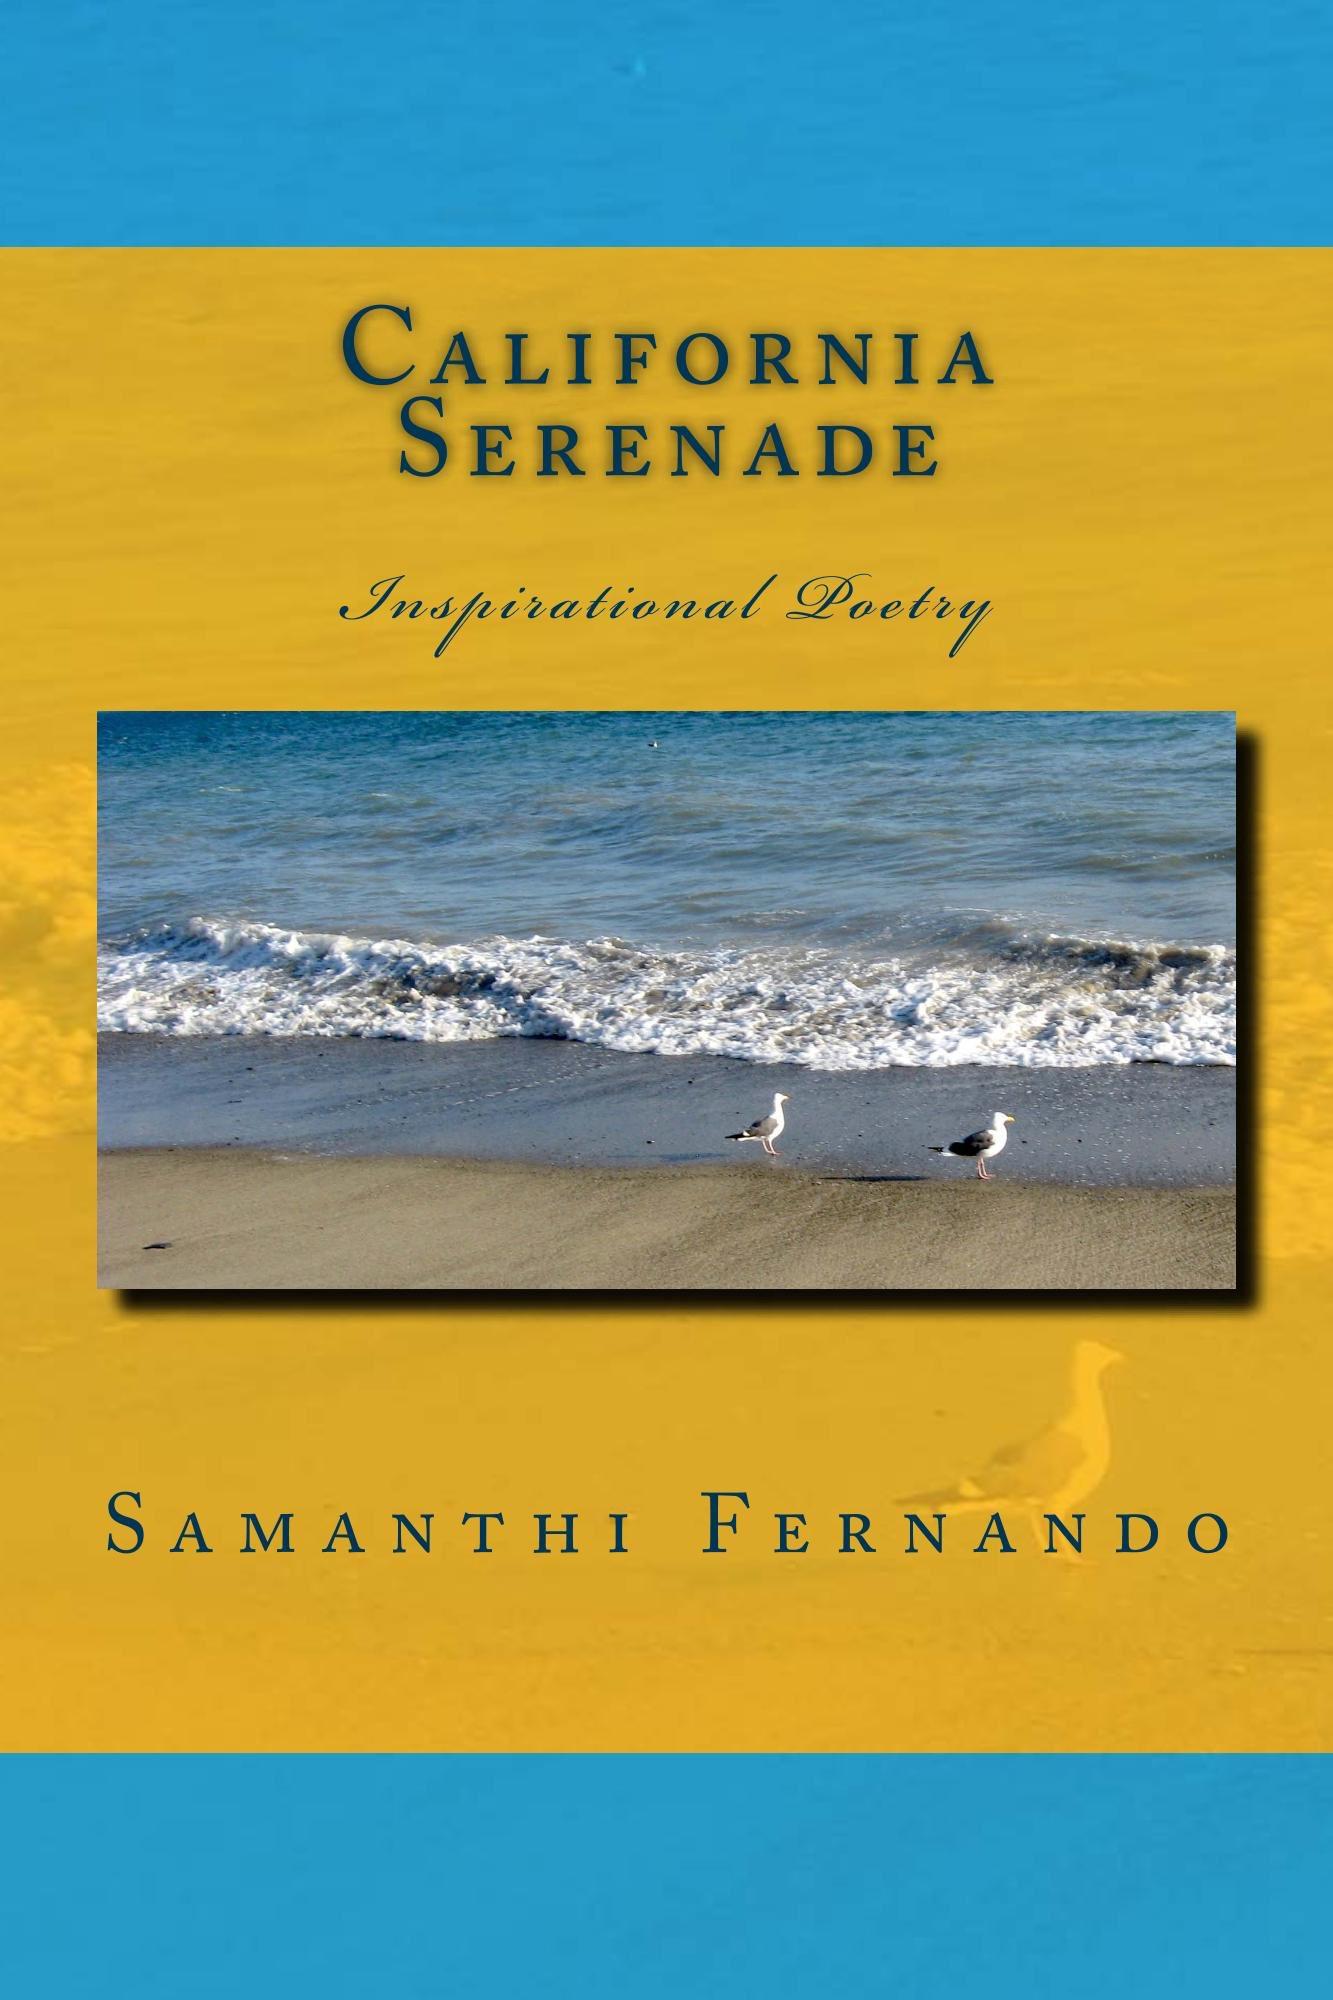 California_Serenade_book_Cover